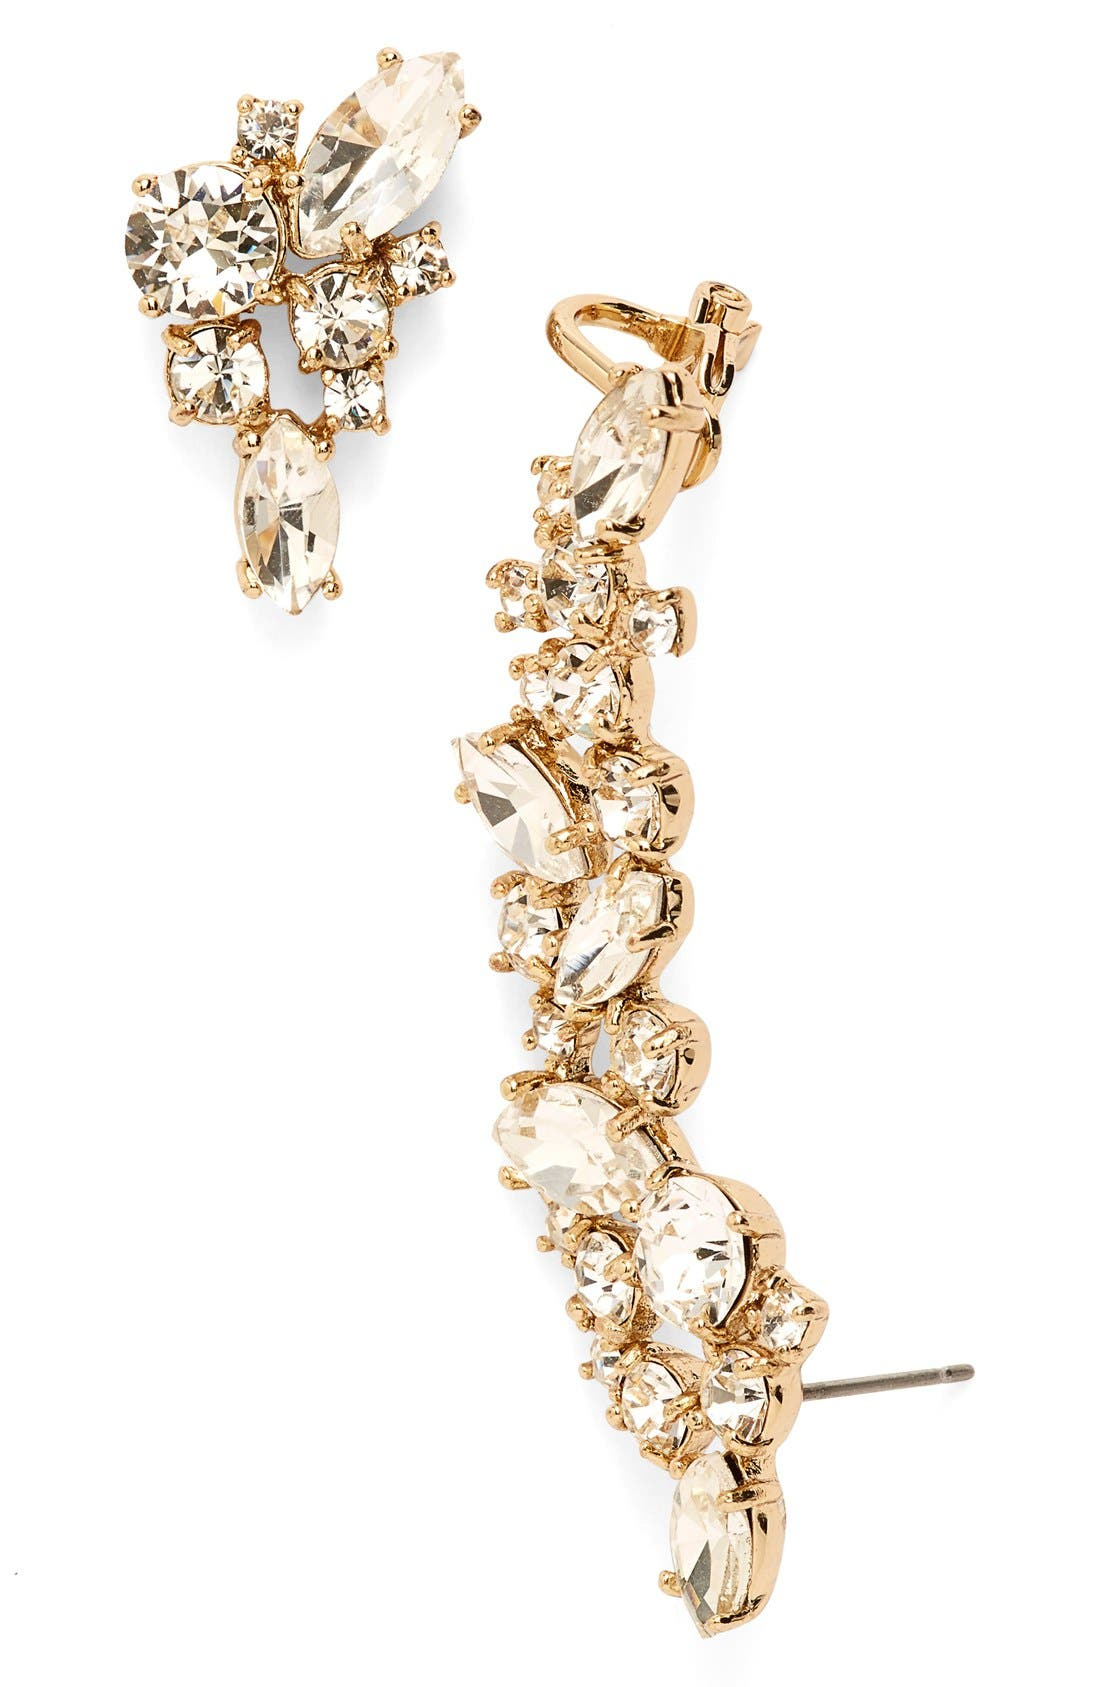 Alternate Image 1 Selected - Marchesa 'Drama' Crystal Ear Crawler & Stud Earring